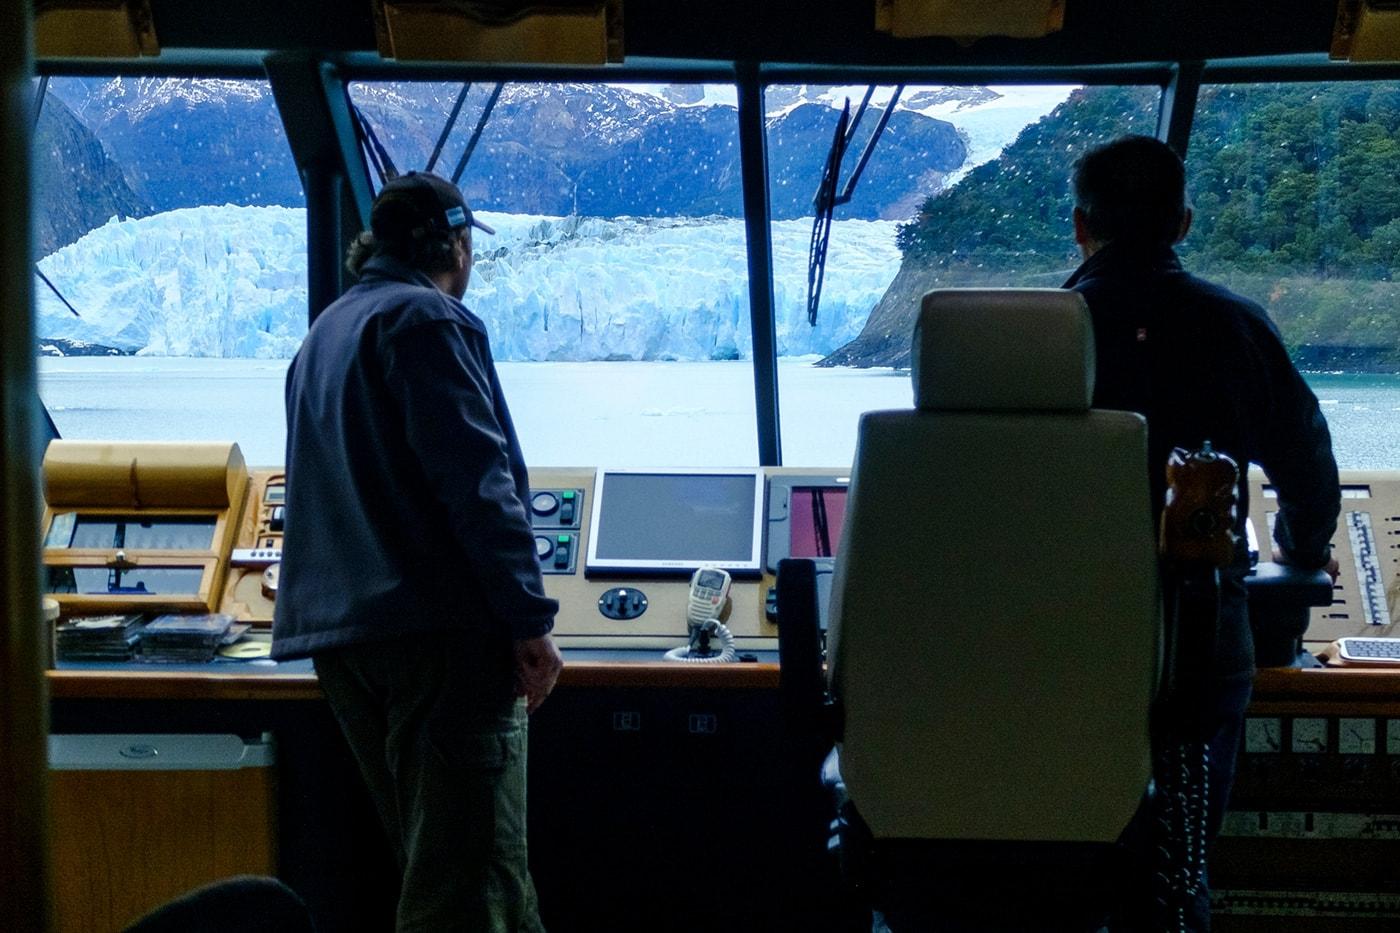 cabina catamarano lago argentino